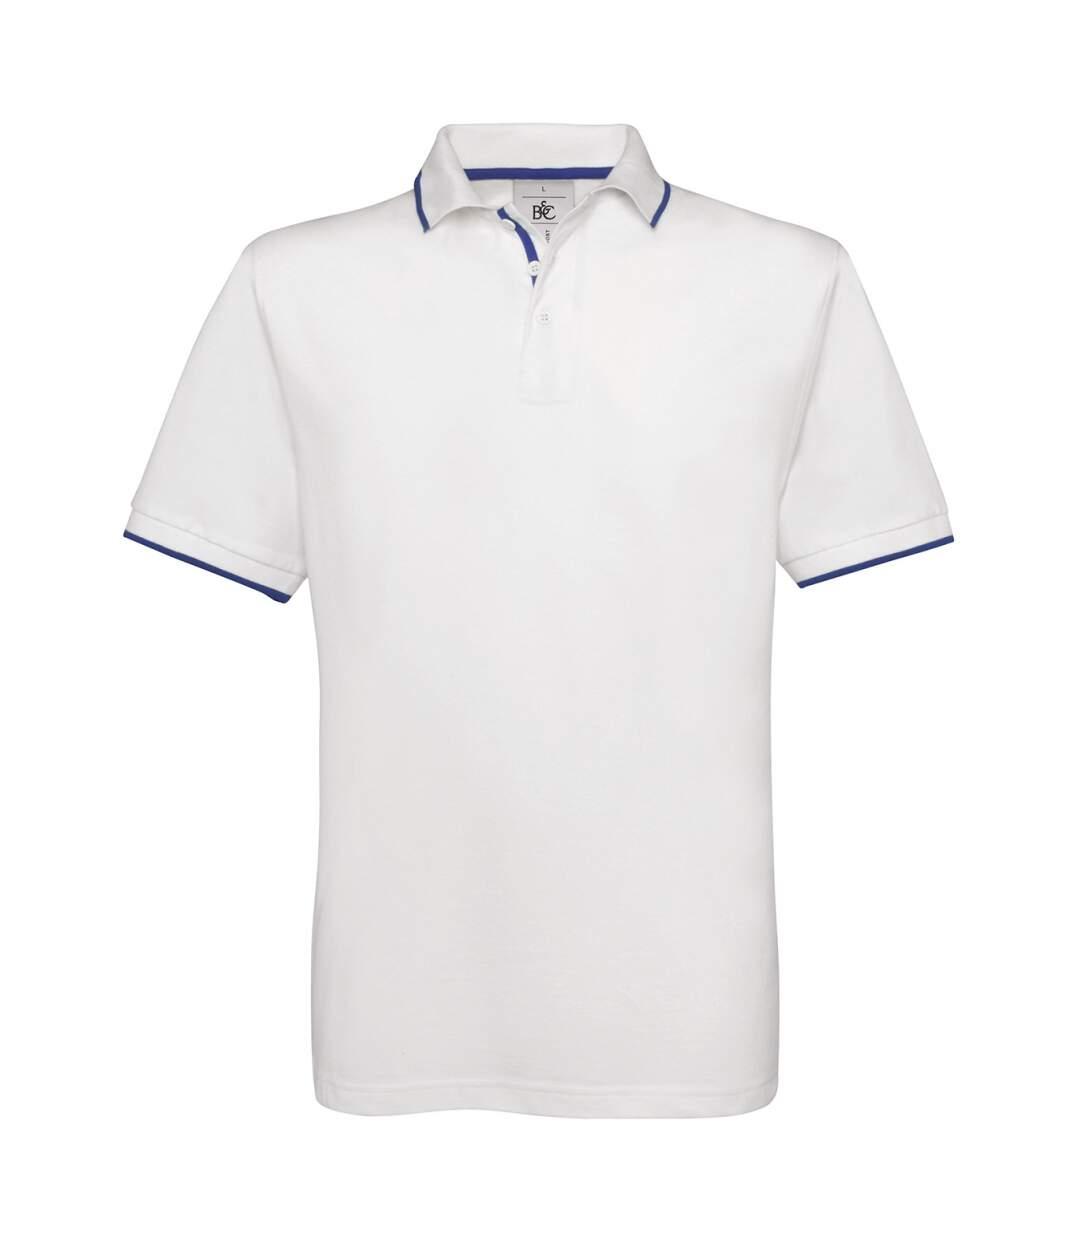 Polo manches courtes inserts contrastés - homme - PU413 - blanc